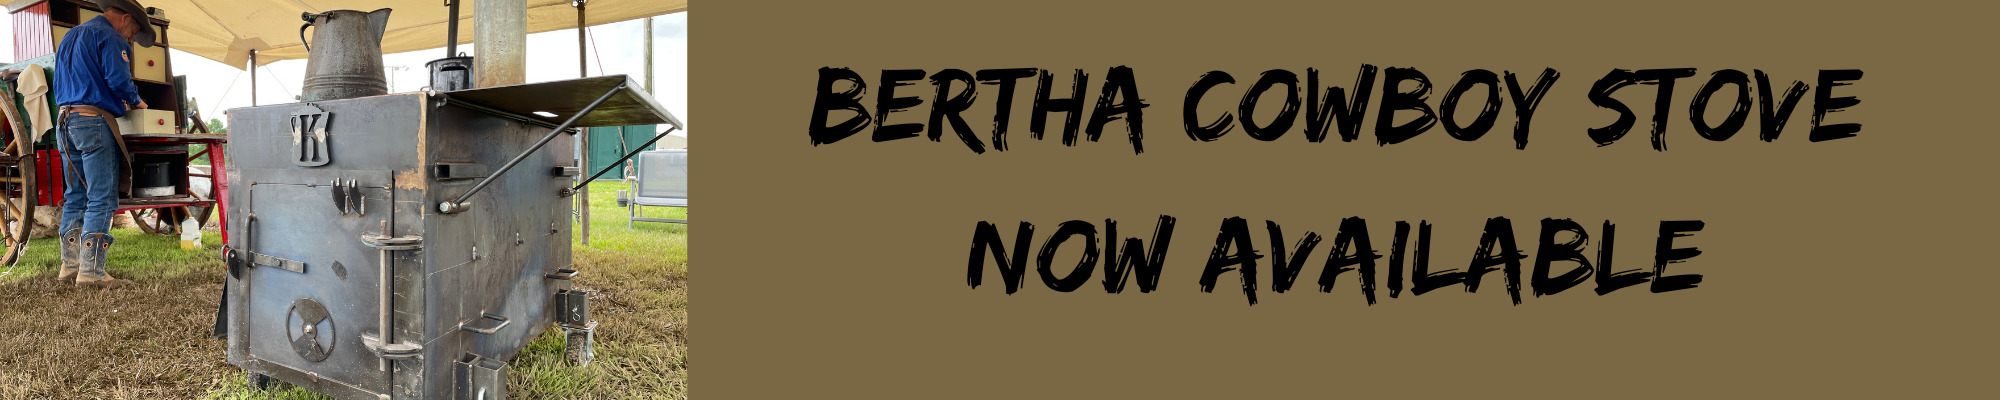 Bertha Grills Coming Soon